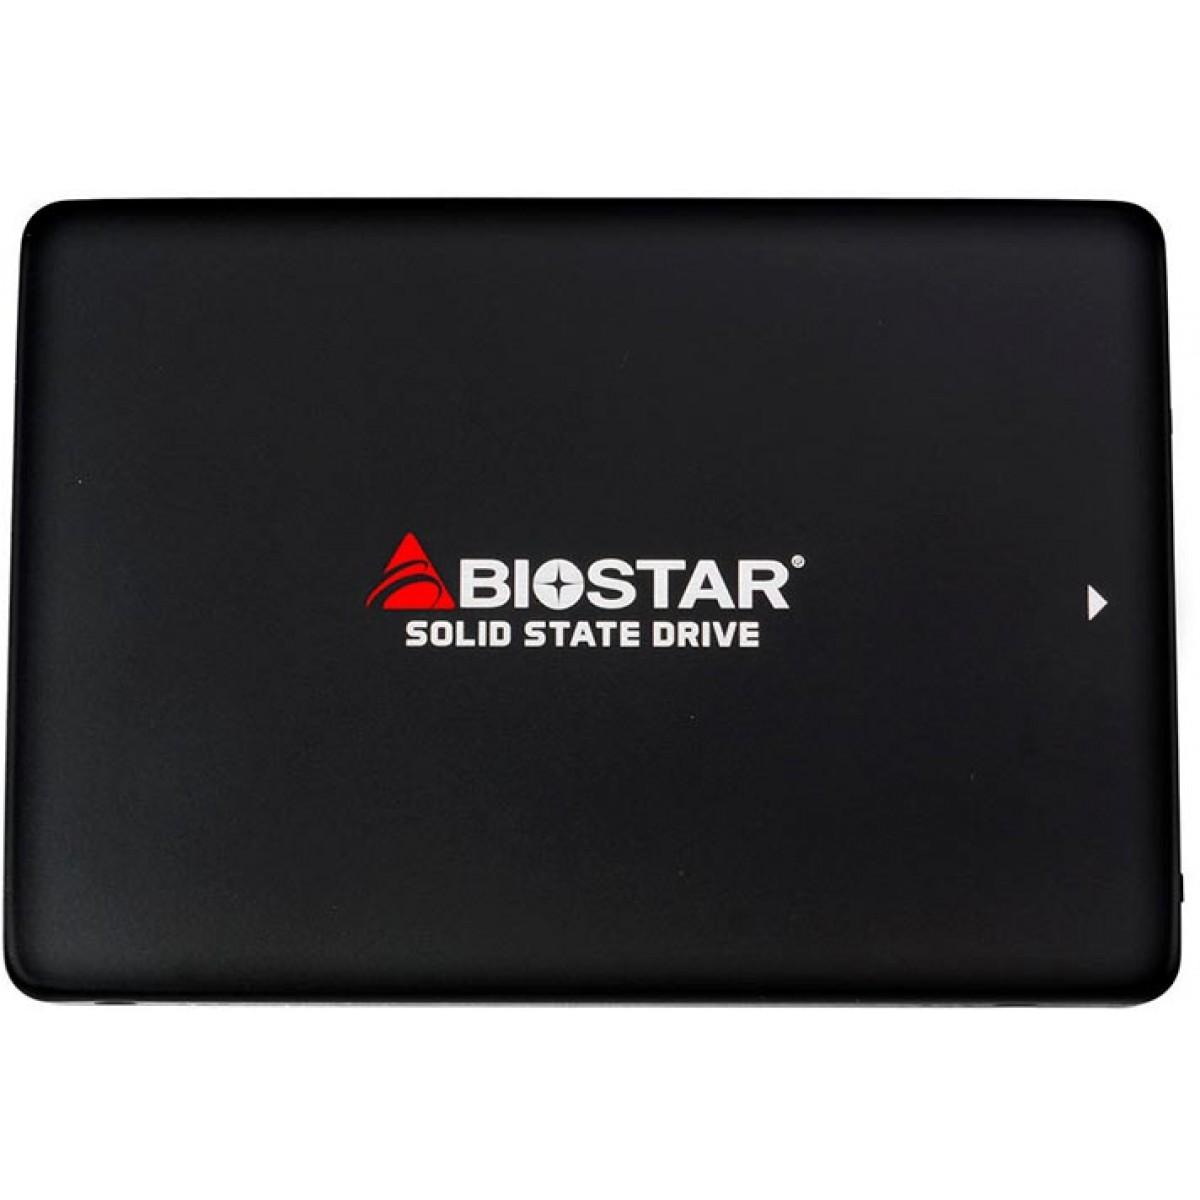 SSD Biostar S120 256GB, Sata III, Leitura 550MBs Gravação 510MBs, SA902S2E36-PS2PH-BS2